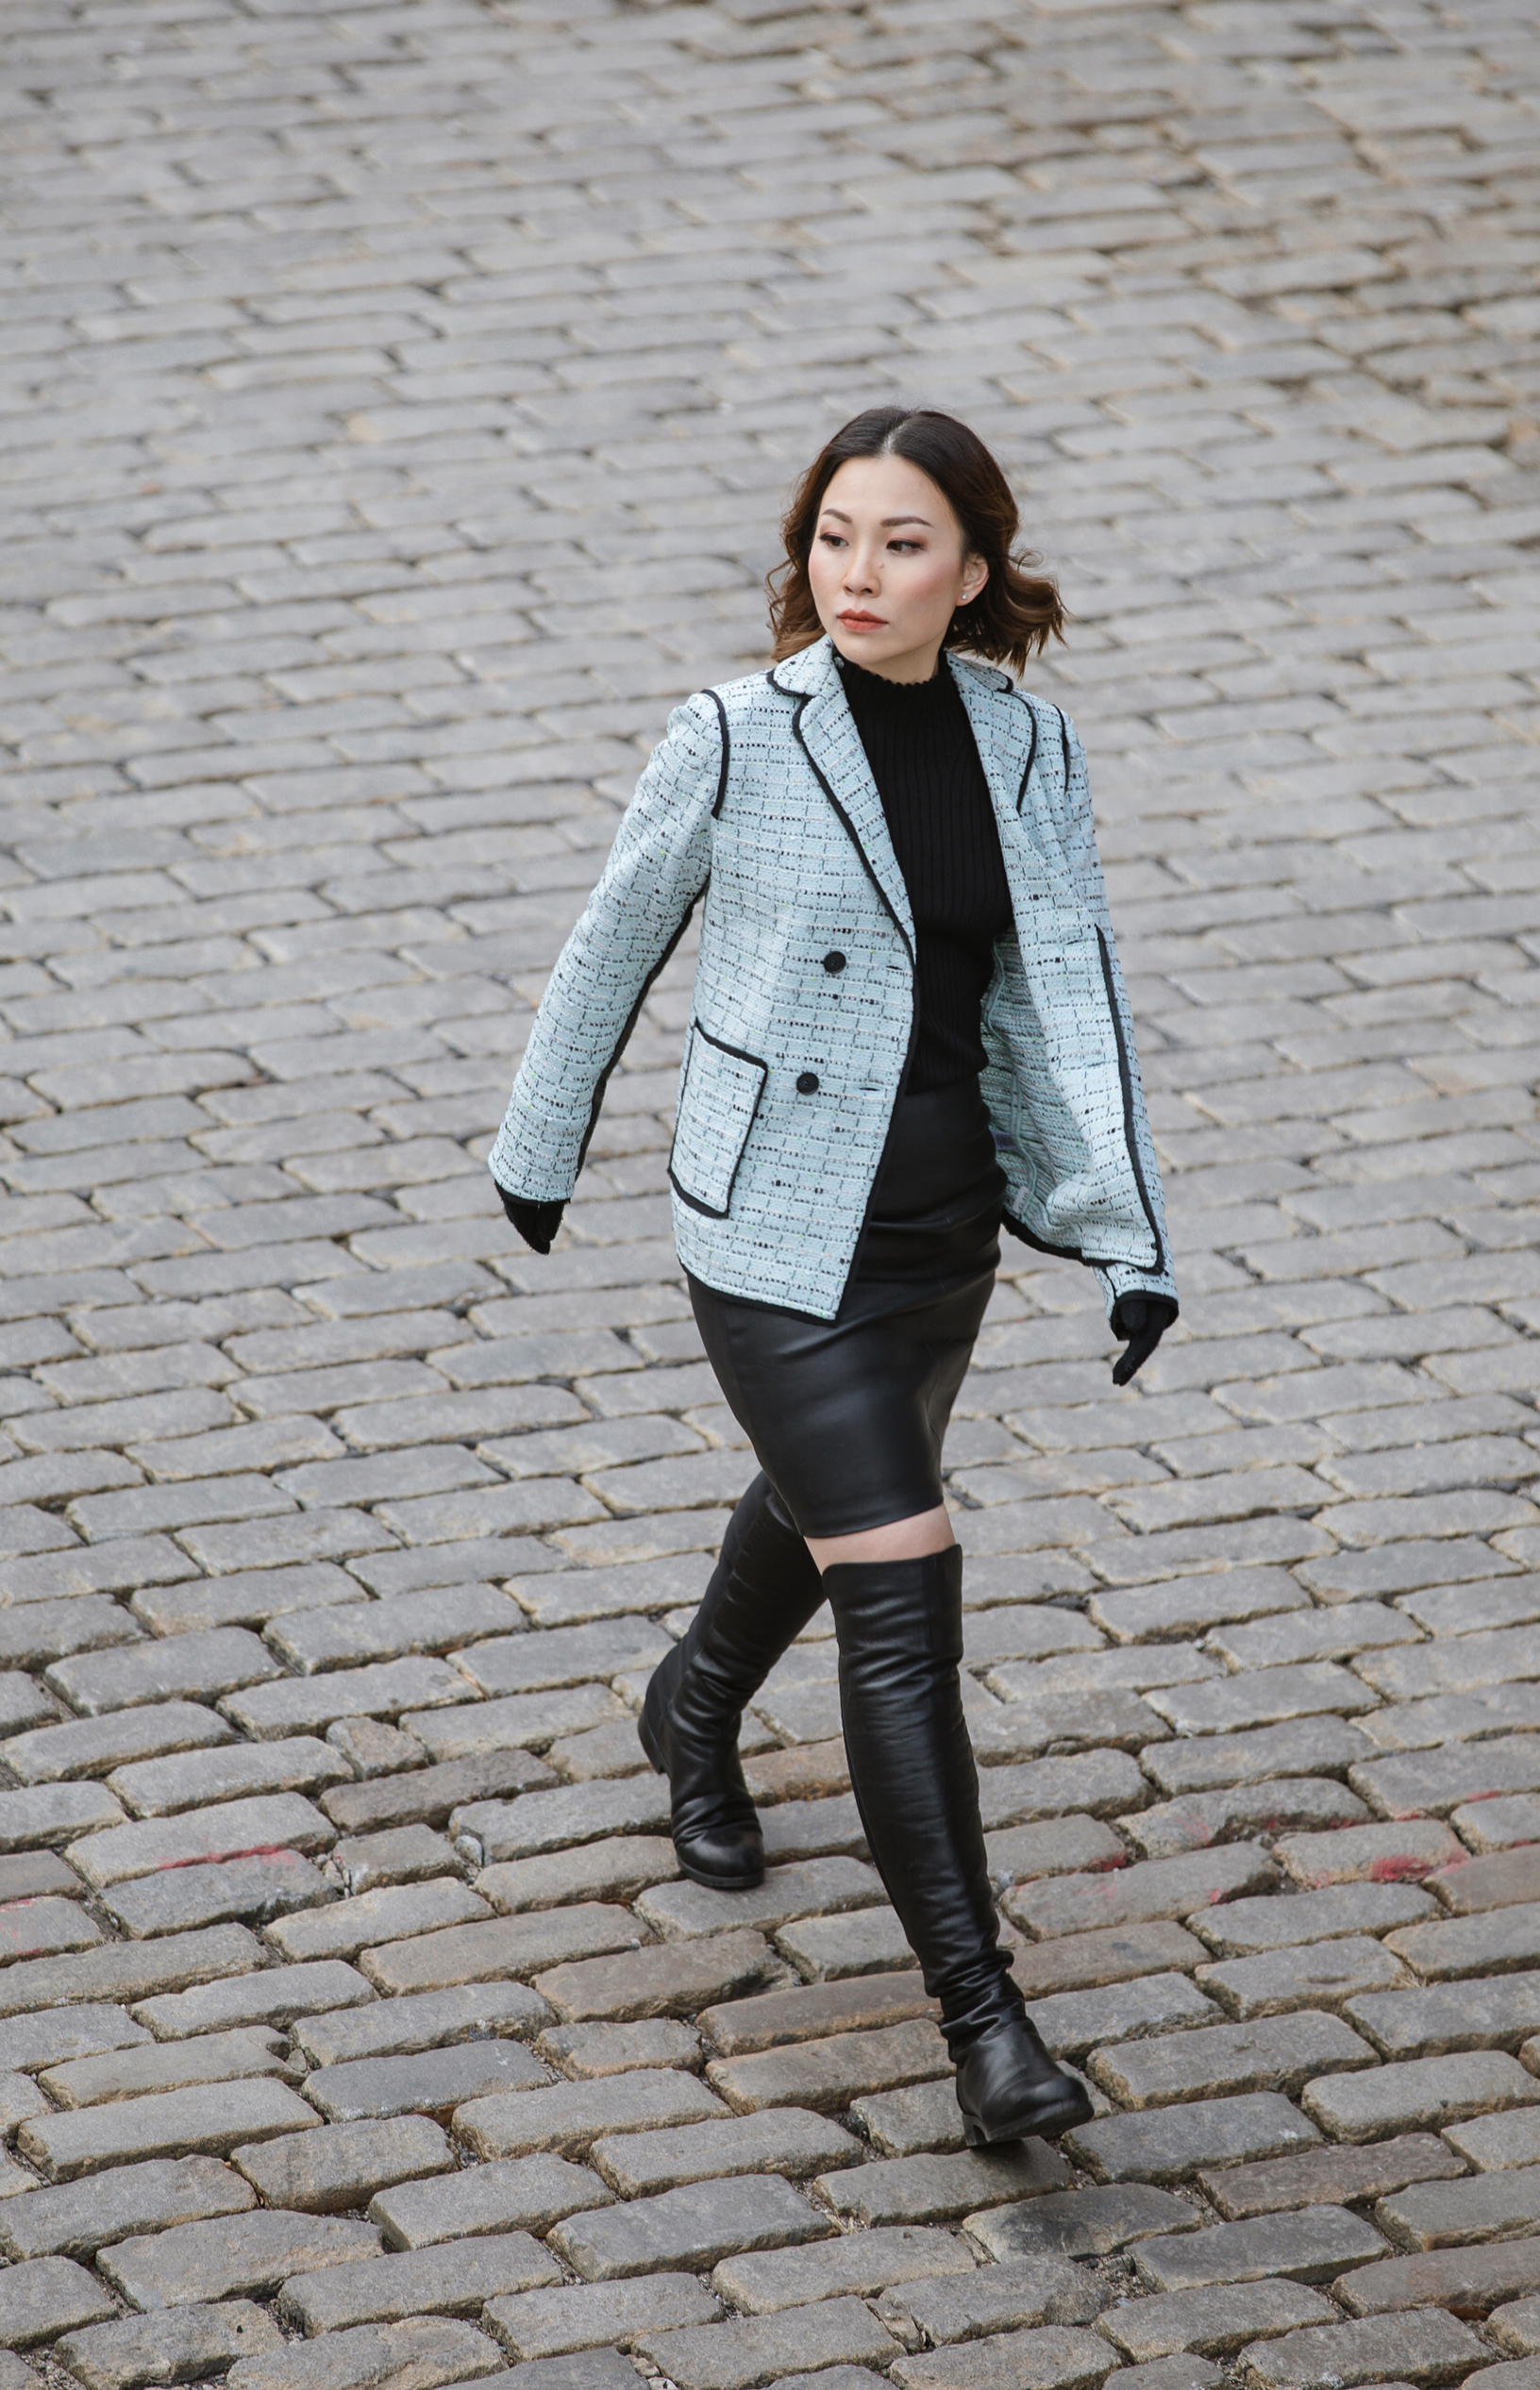 st john knits adriana multi tweed jacket nyc style.JPG